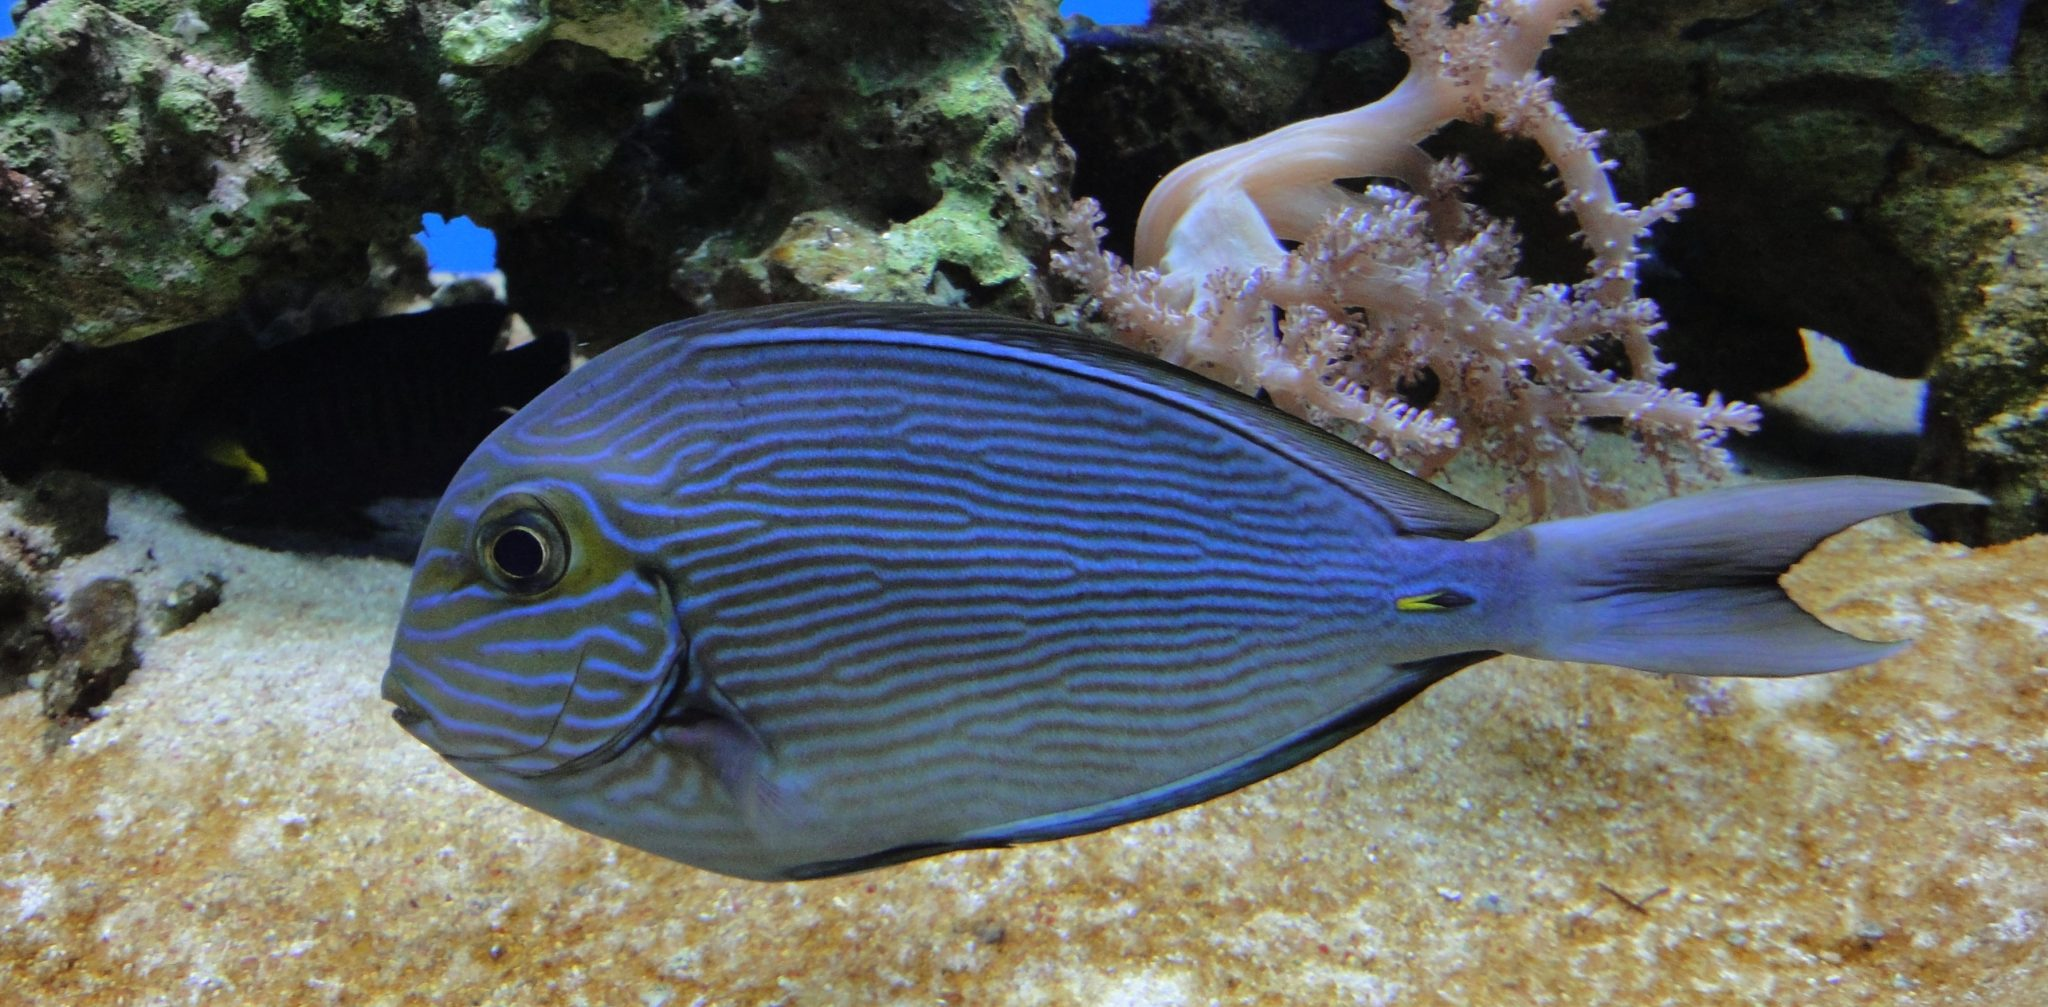 Acanthurus sohal, Sohal Surgeonfish, Red Sea Clown Surgeon, Red Sea Surgeonfish